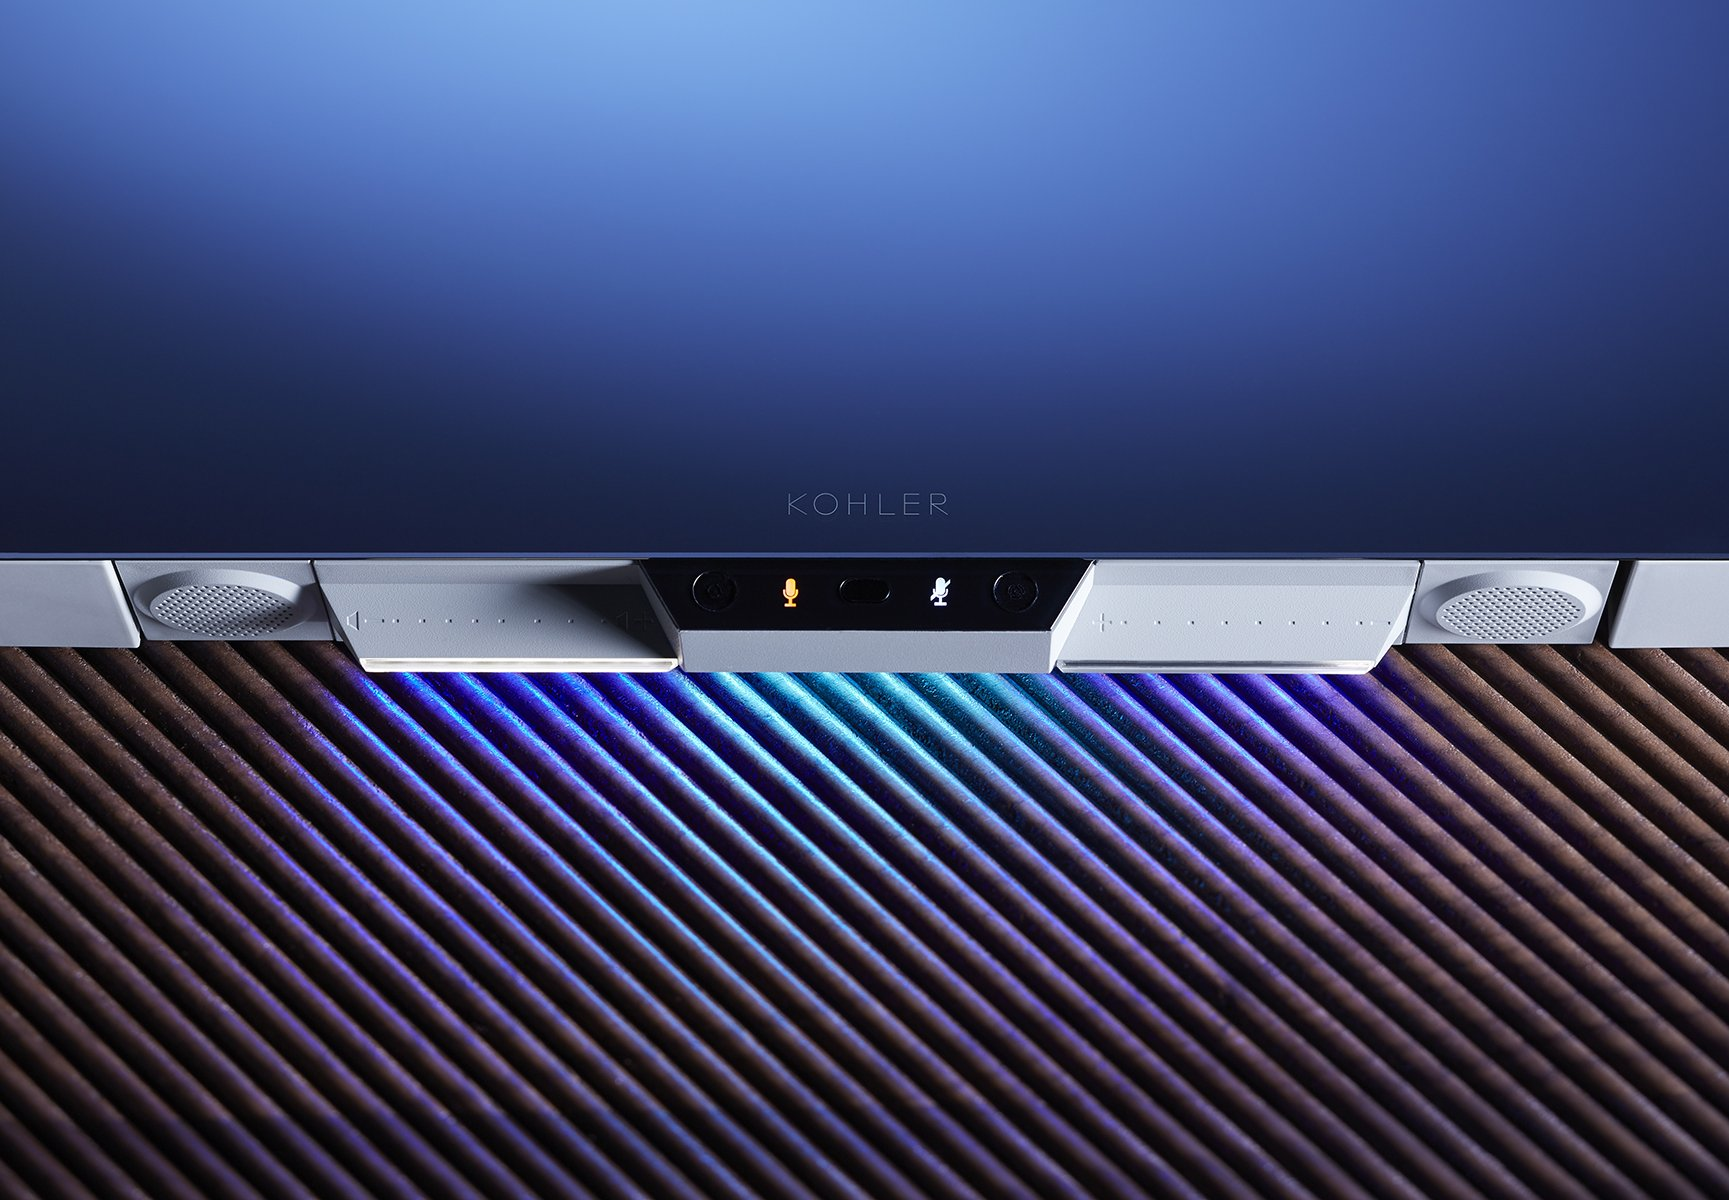 KOHLER 99573-VLAN-NA Verdera Voice 40 in. x 33 in. Lighted Mirror- Works with Alexa by Kohler (Image #4)